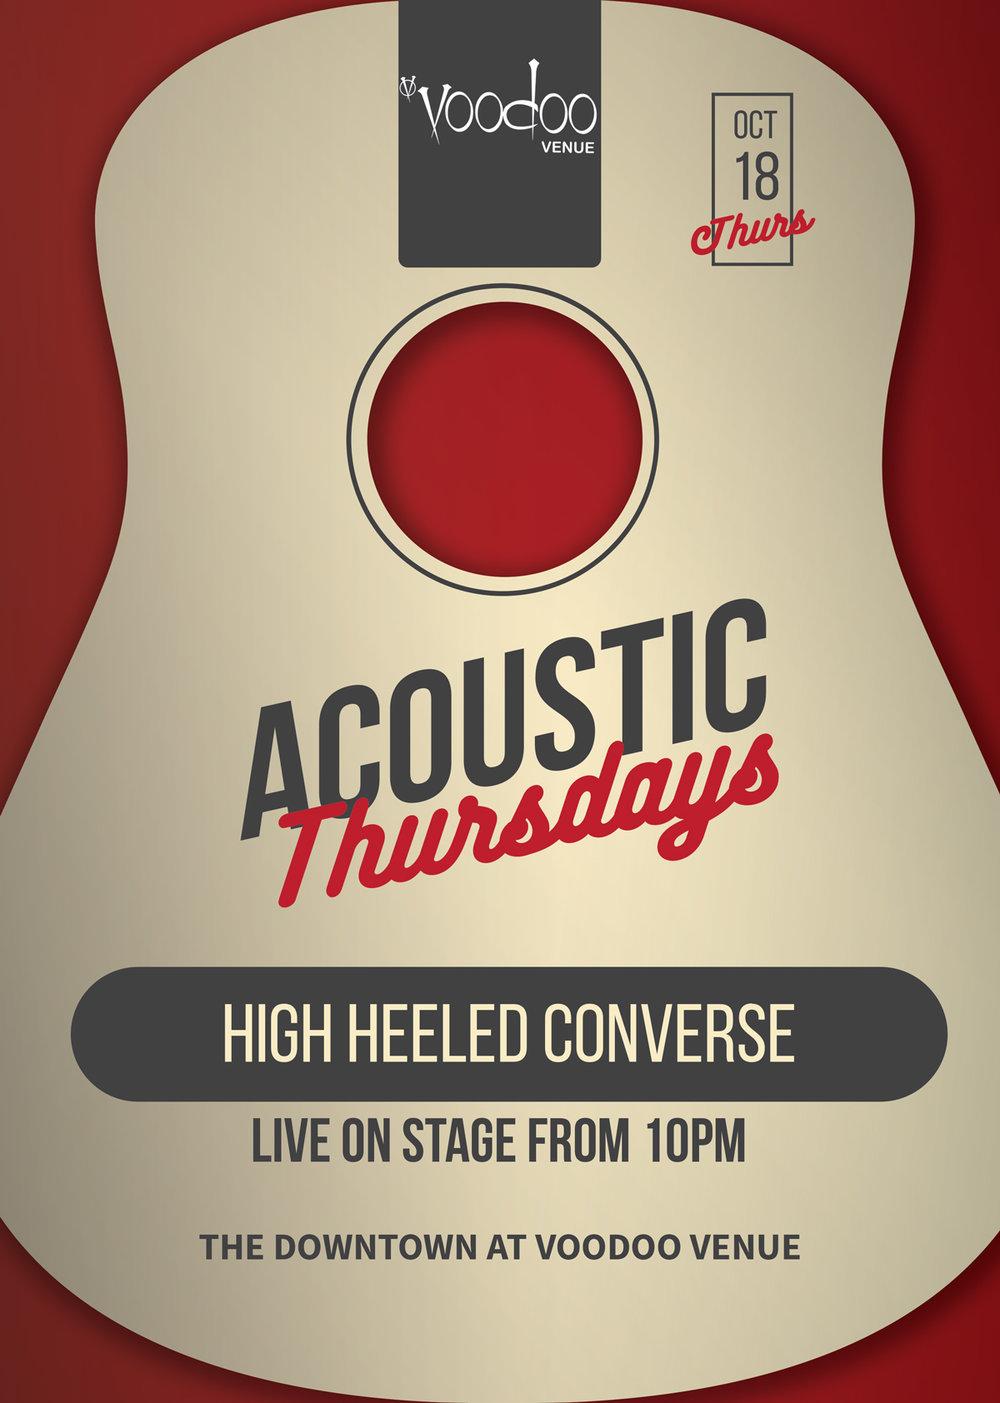 VOODOO-acoustic-thursdays-high-heeld-converse---thurs-oct-18-2018.jpg